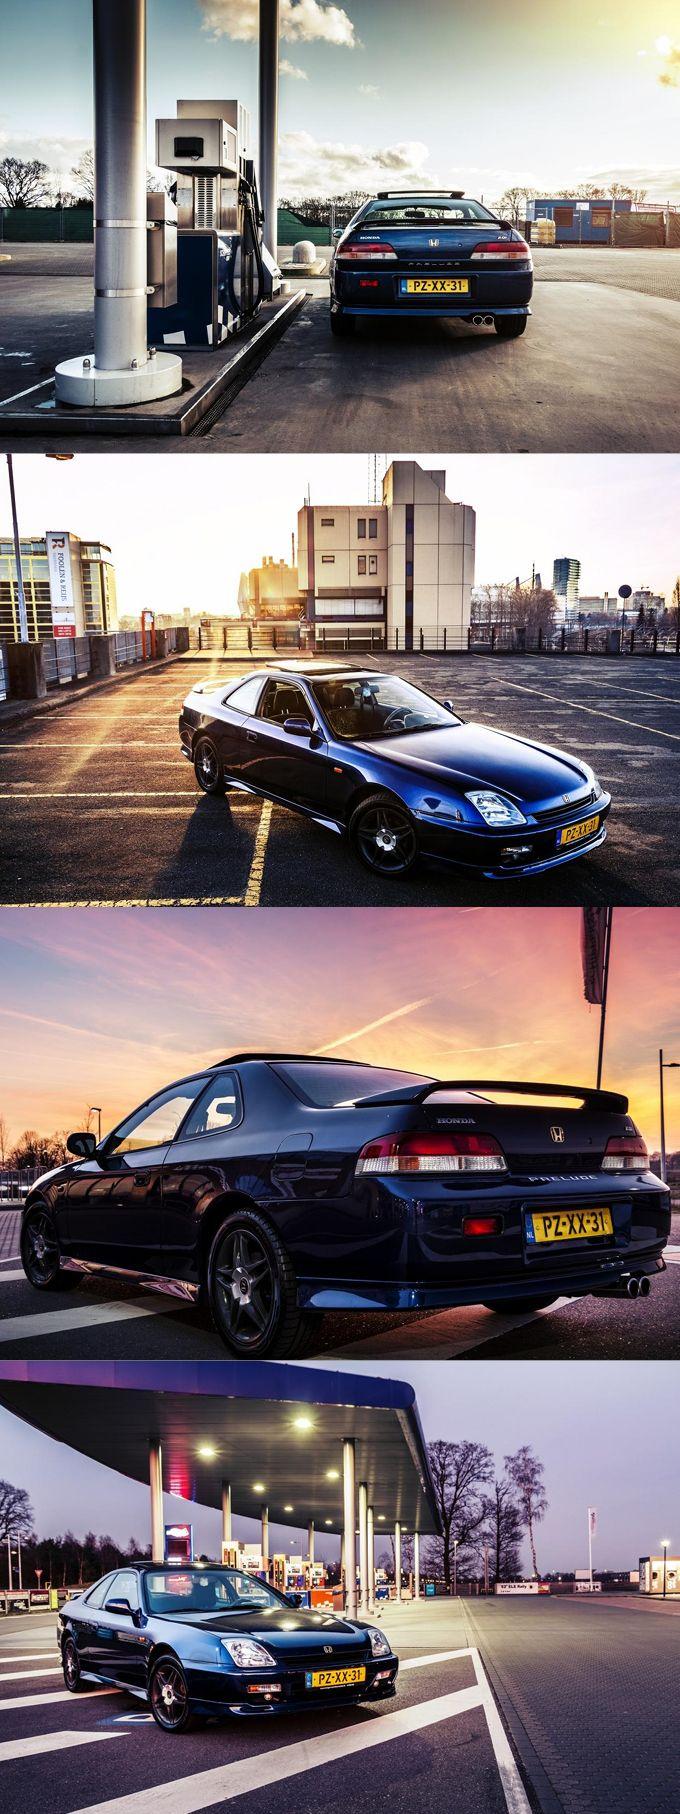 1997 Honda Prelude / blue / Japan / 17-246